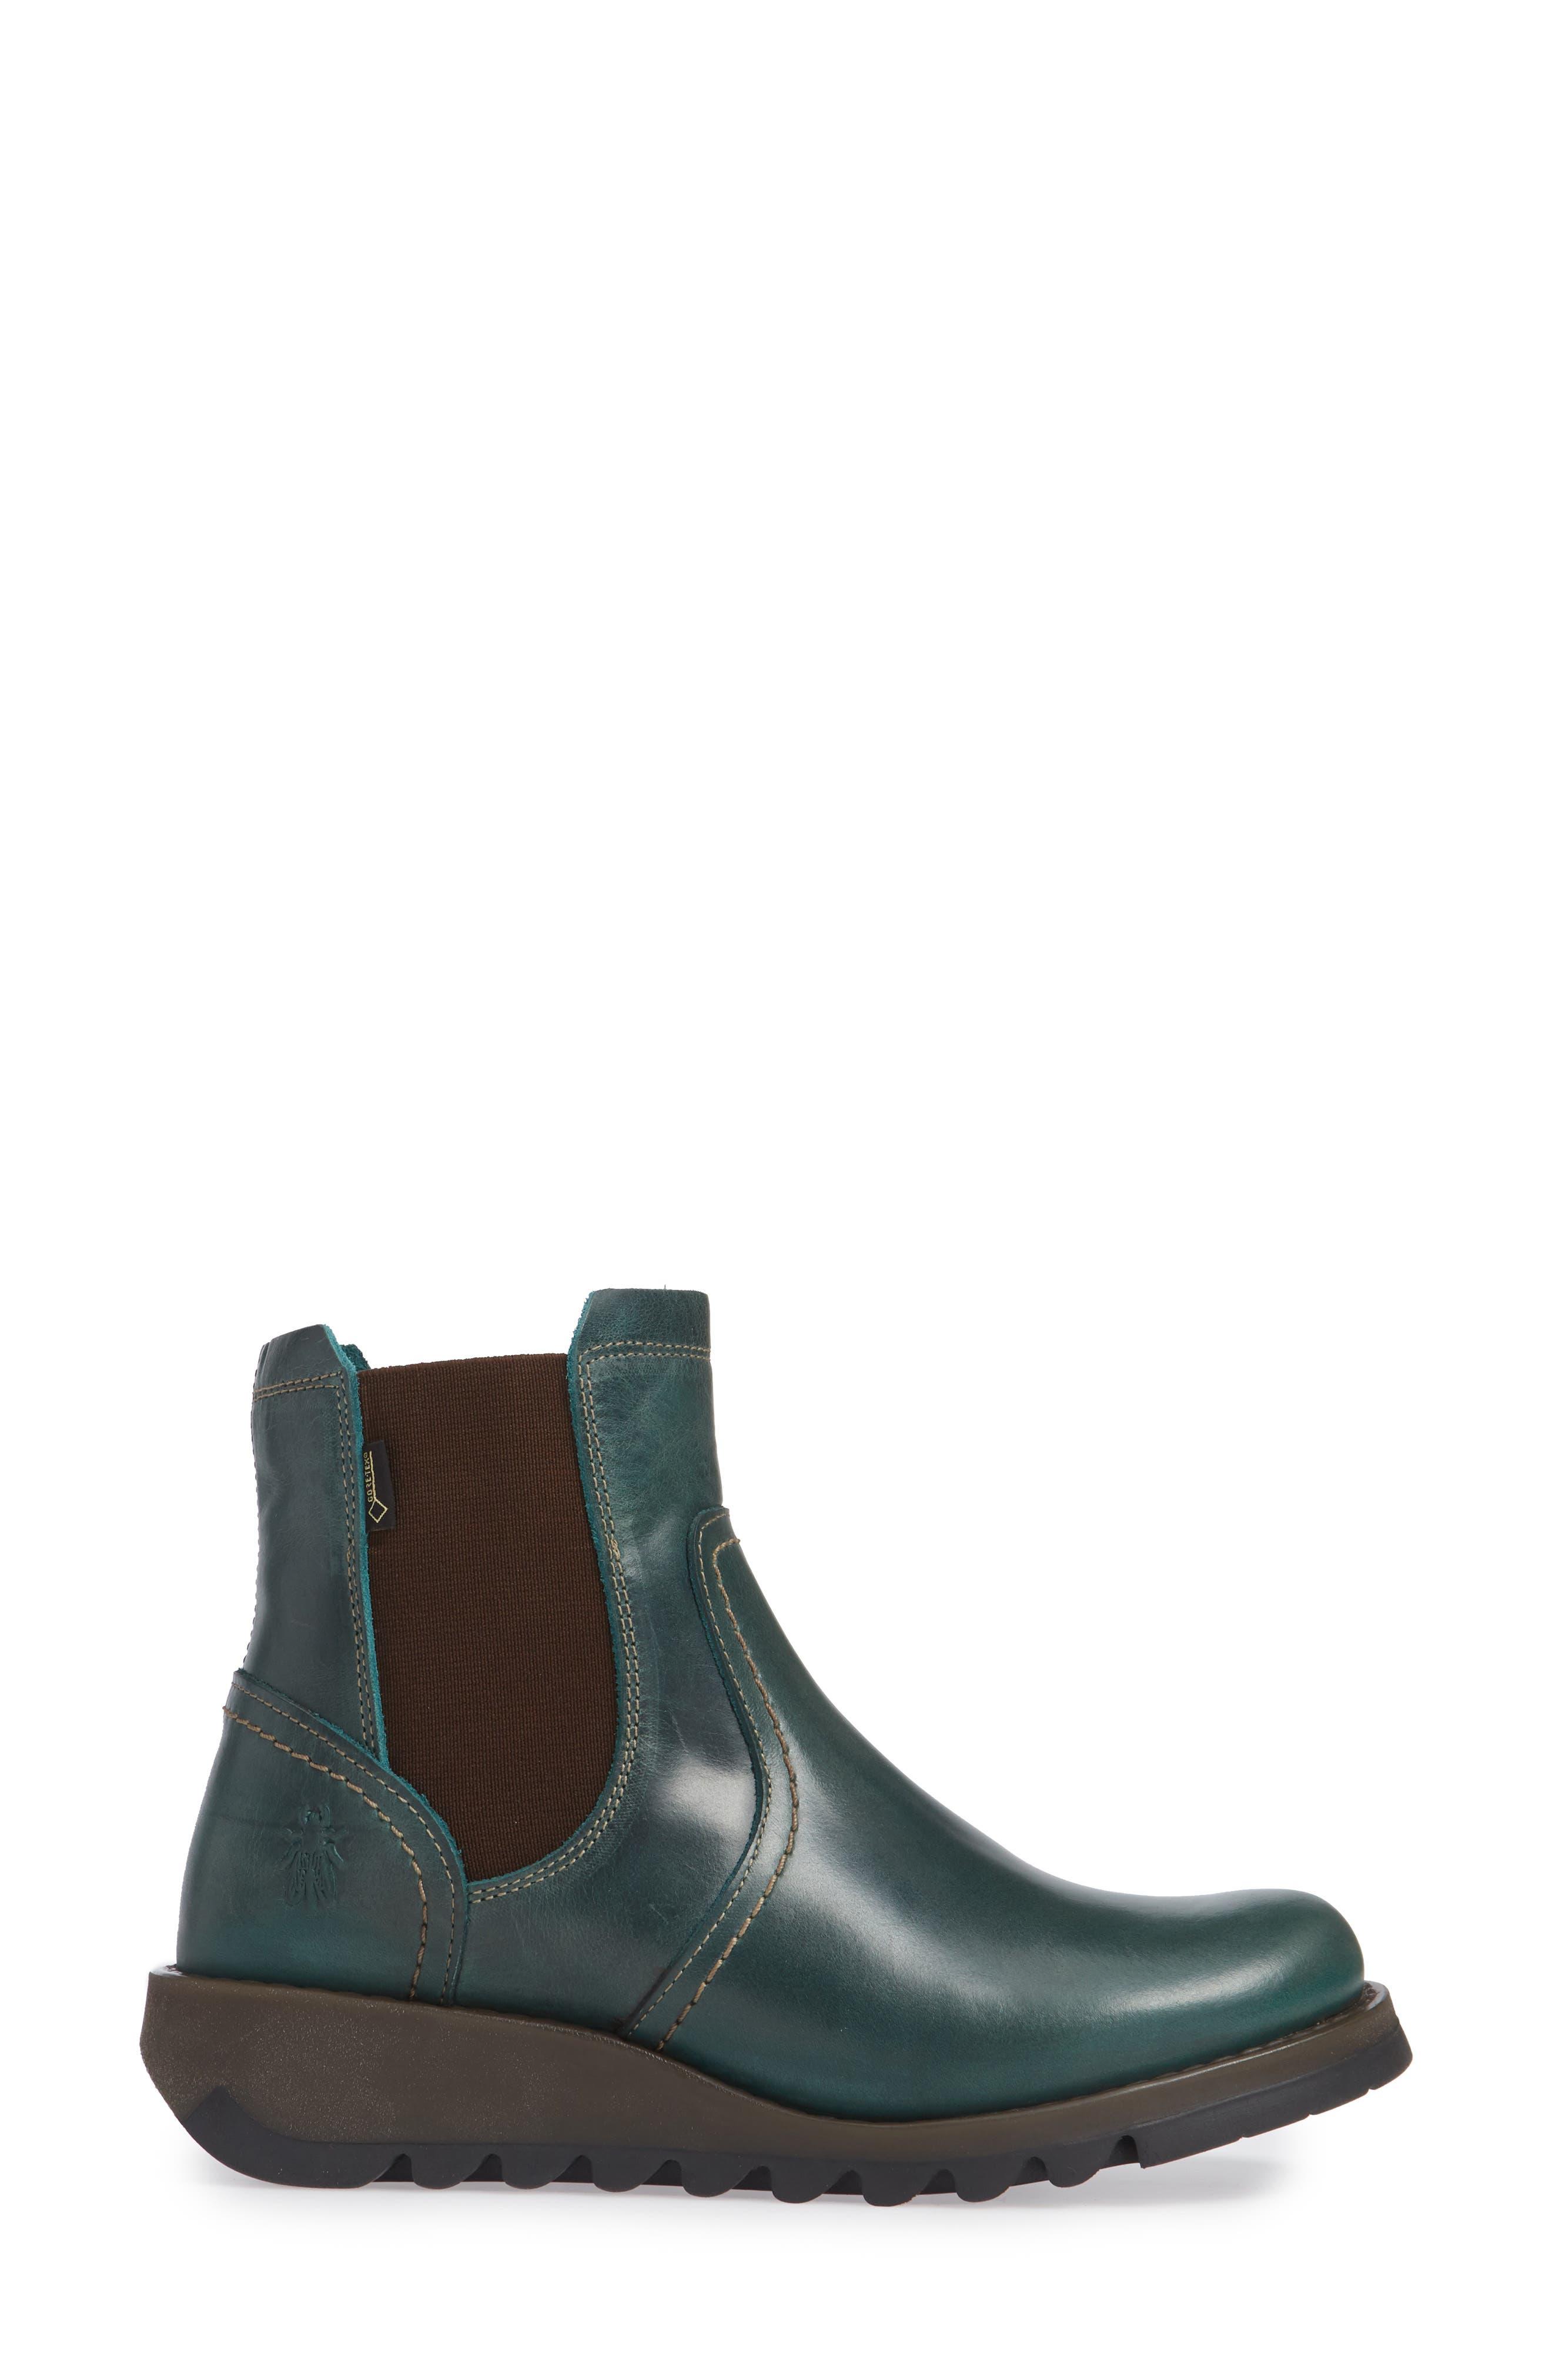 Scon Waterproof Gore-Tex<sup>®</sup> Chelsea Boot,                             Alternate thumbnail 3, color,                             PETROL